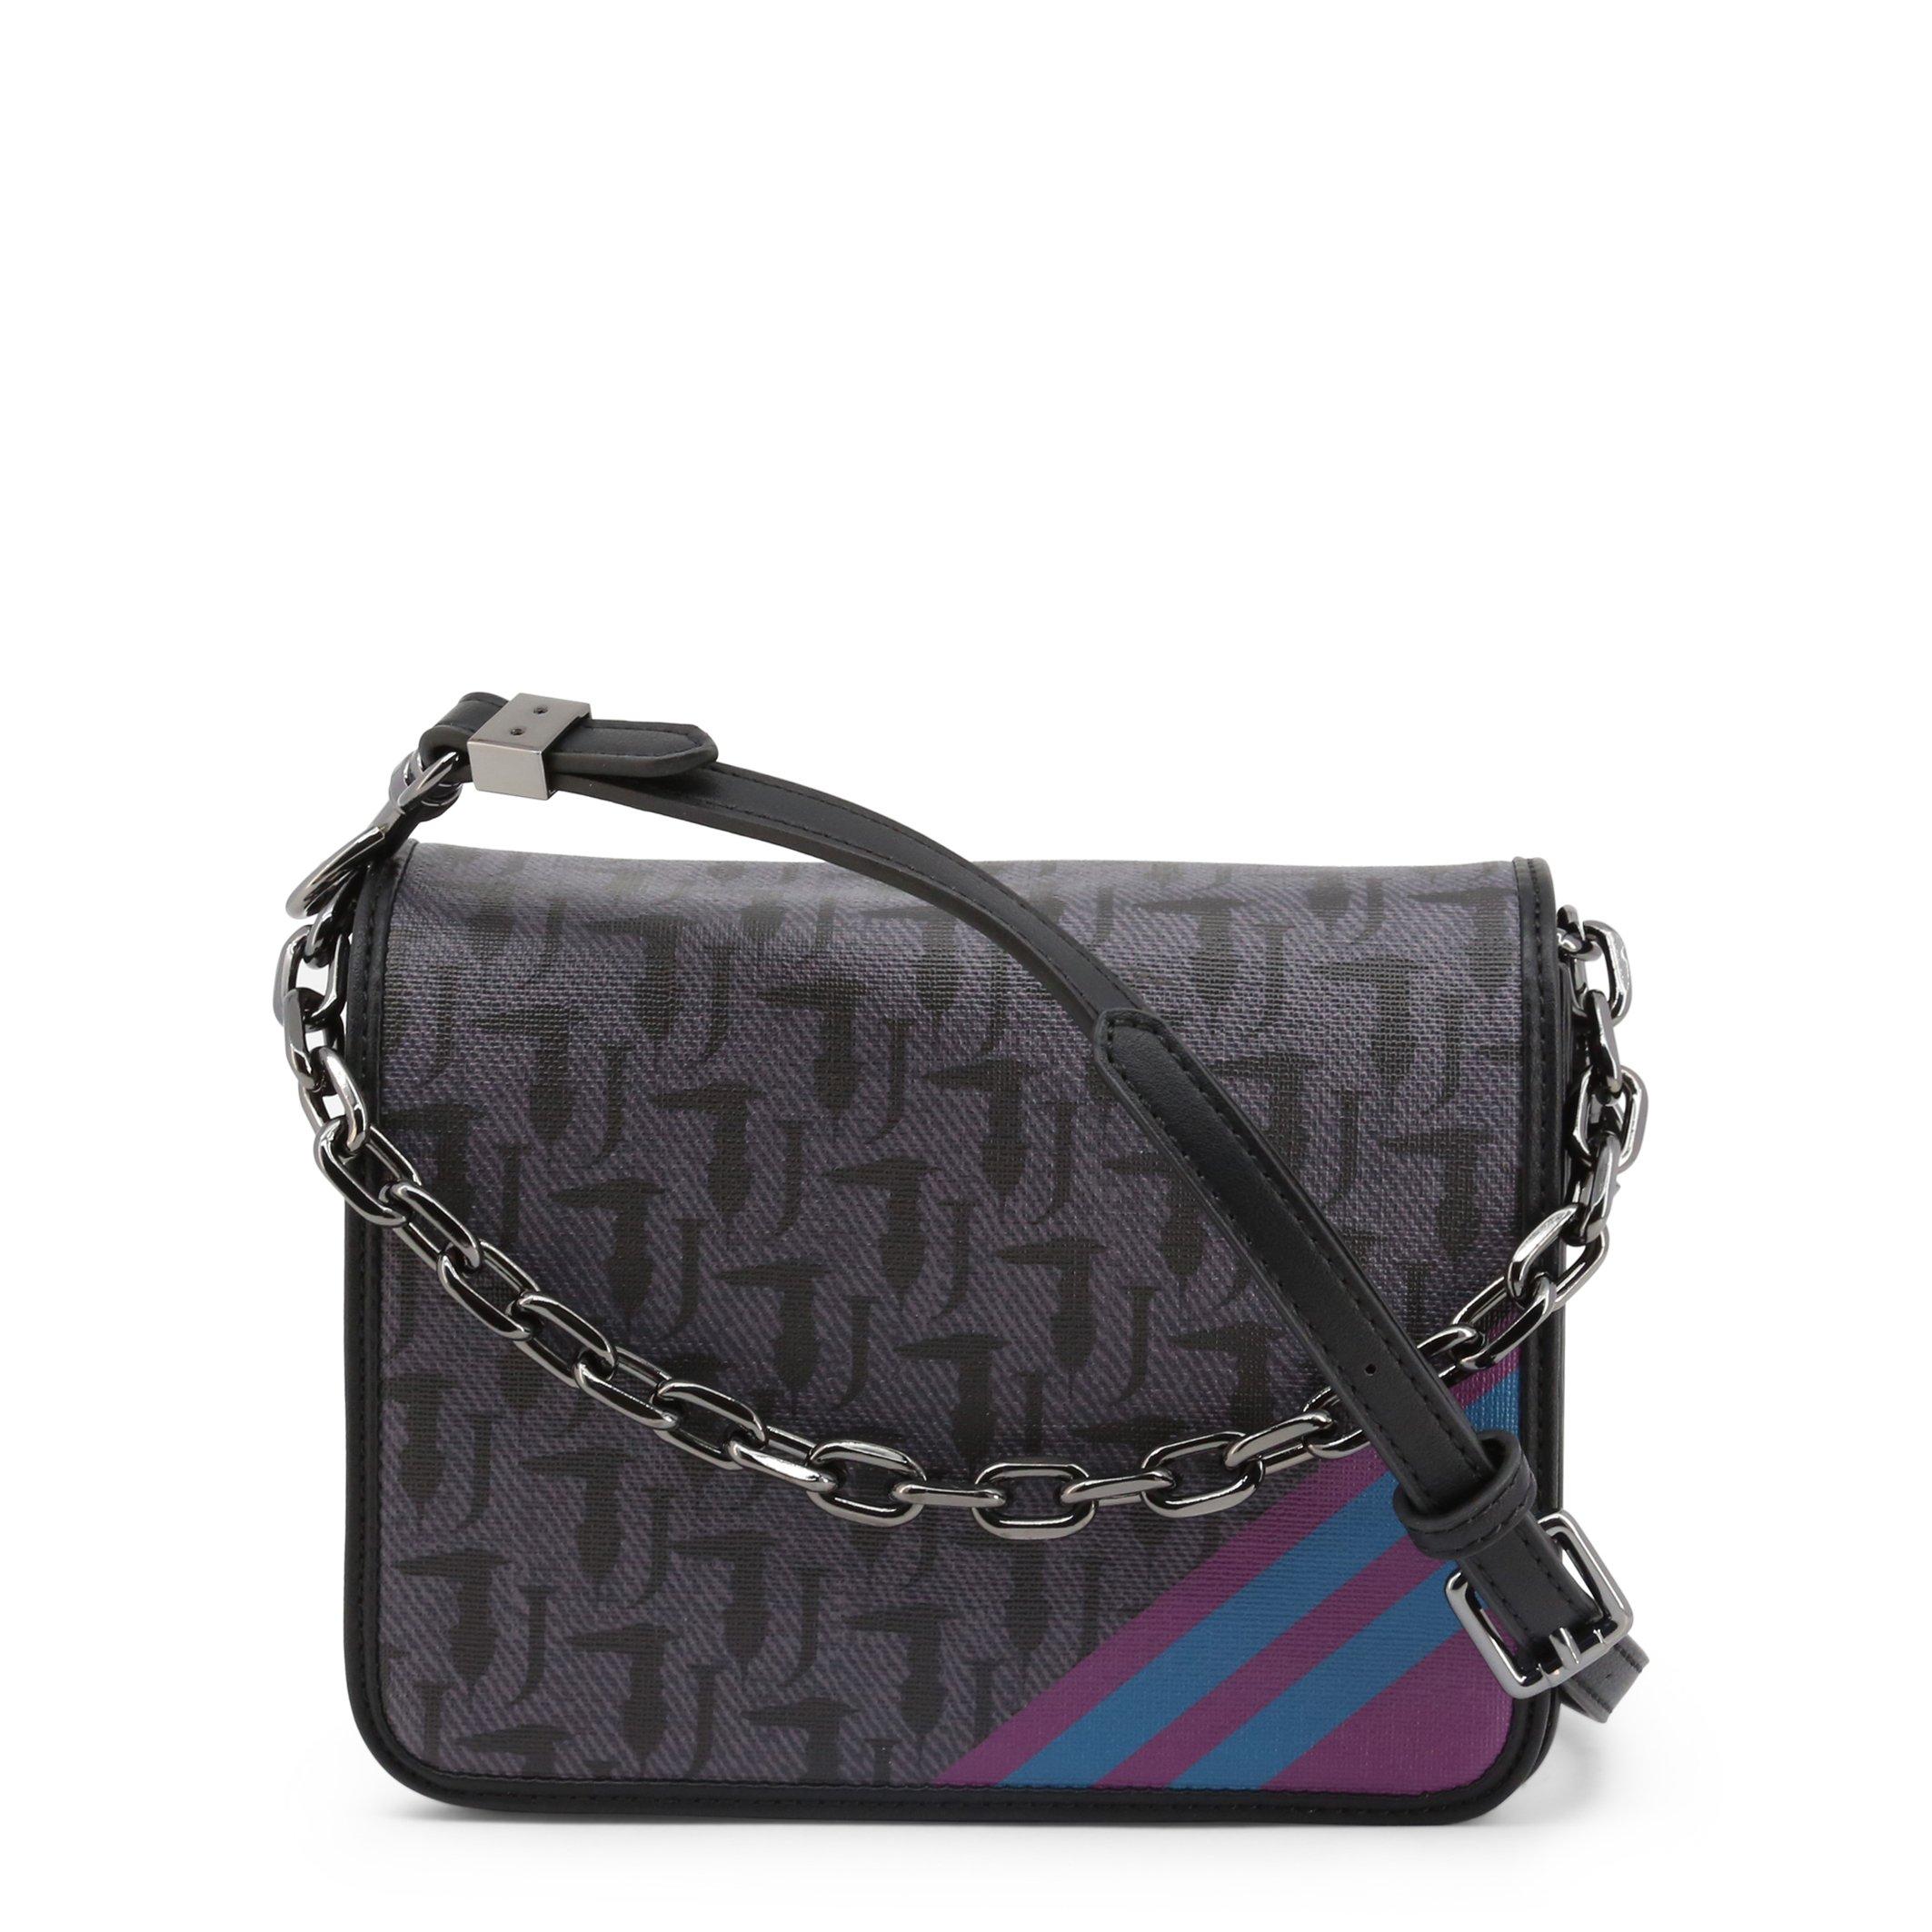 Trussardi Women's Crossbody Bag Various Colours VANIGLIA_75B0048 - black NOSIZE